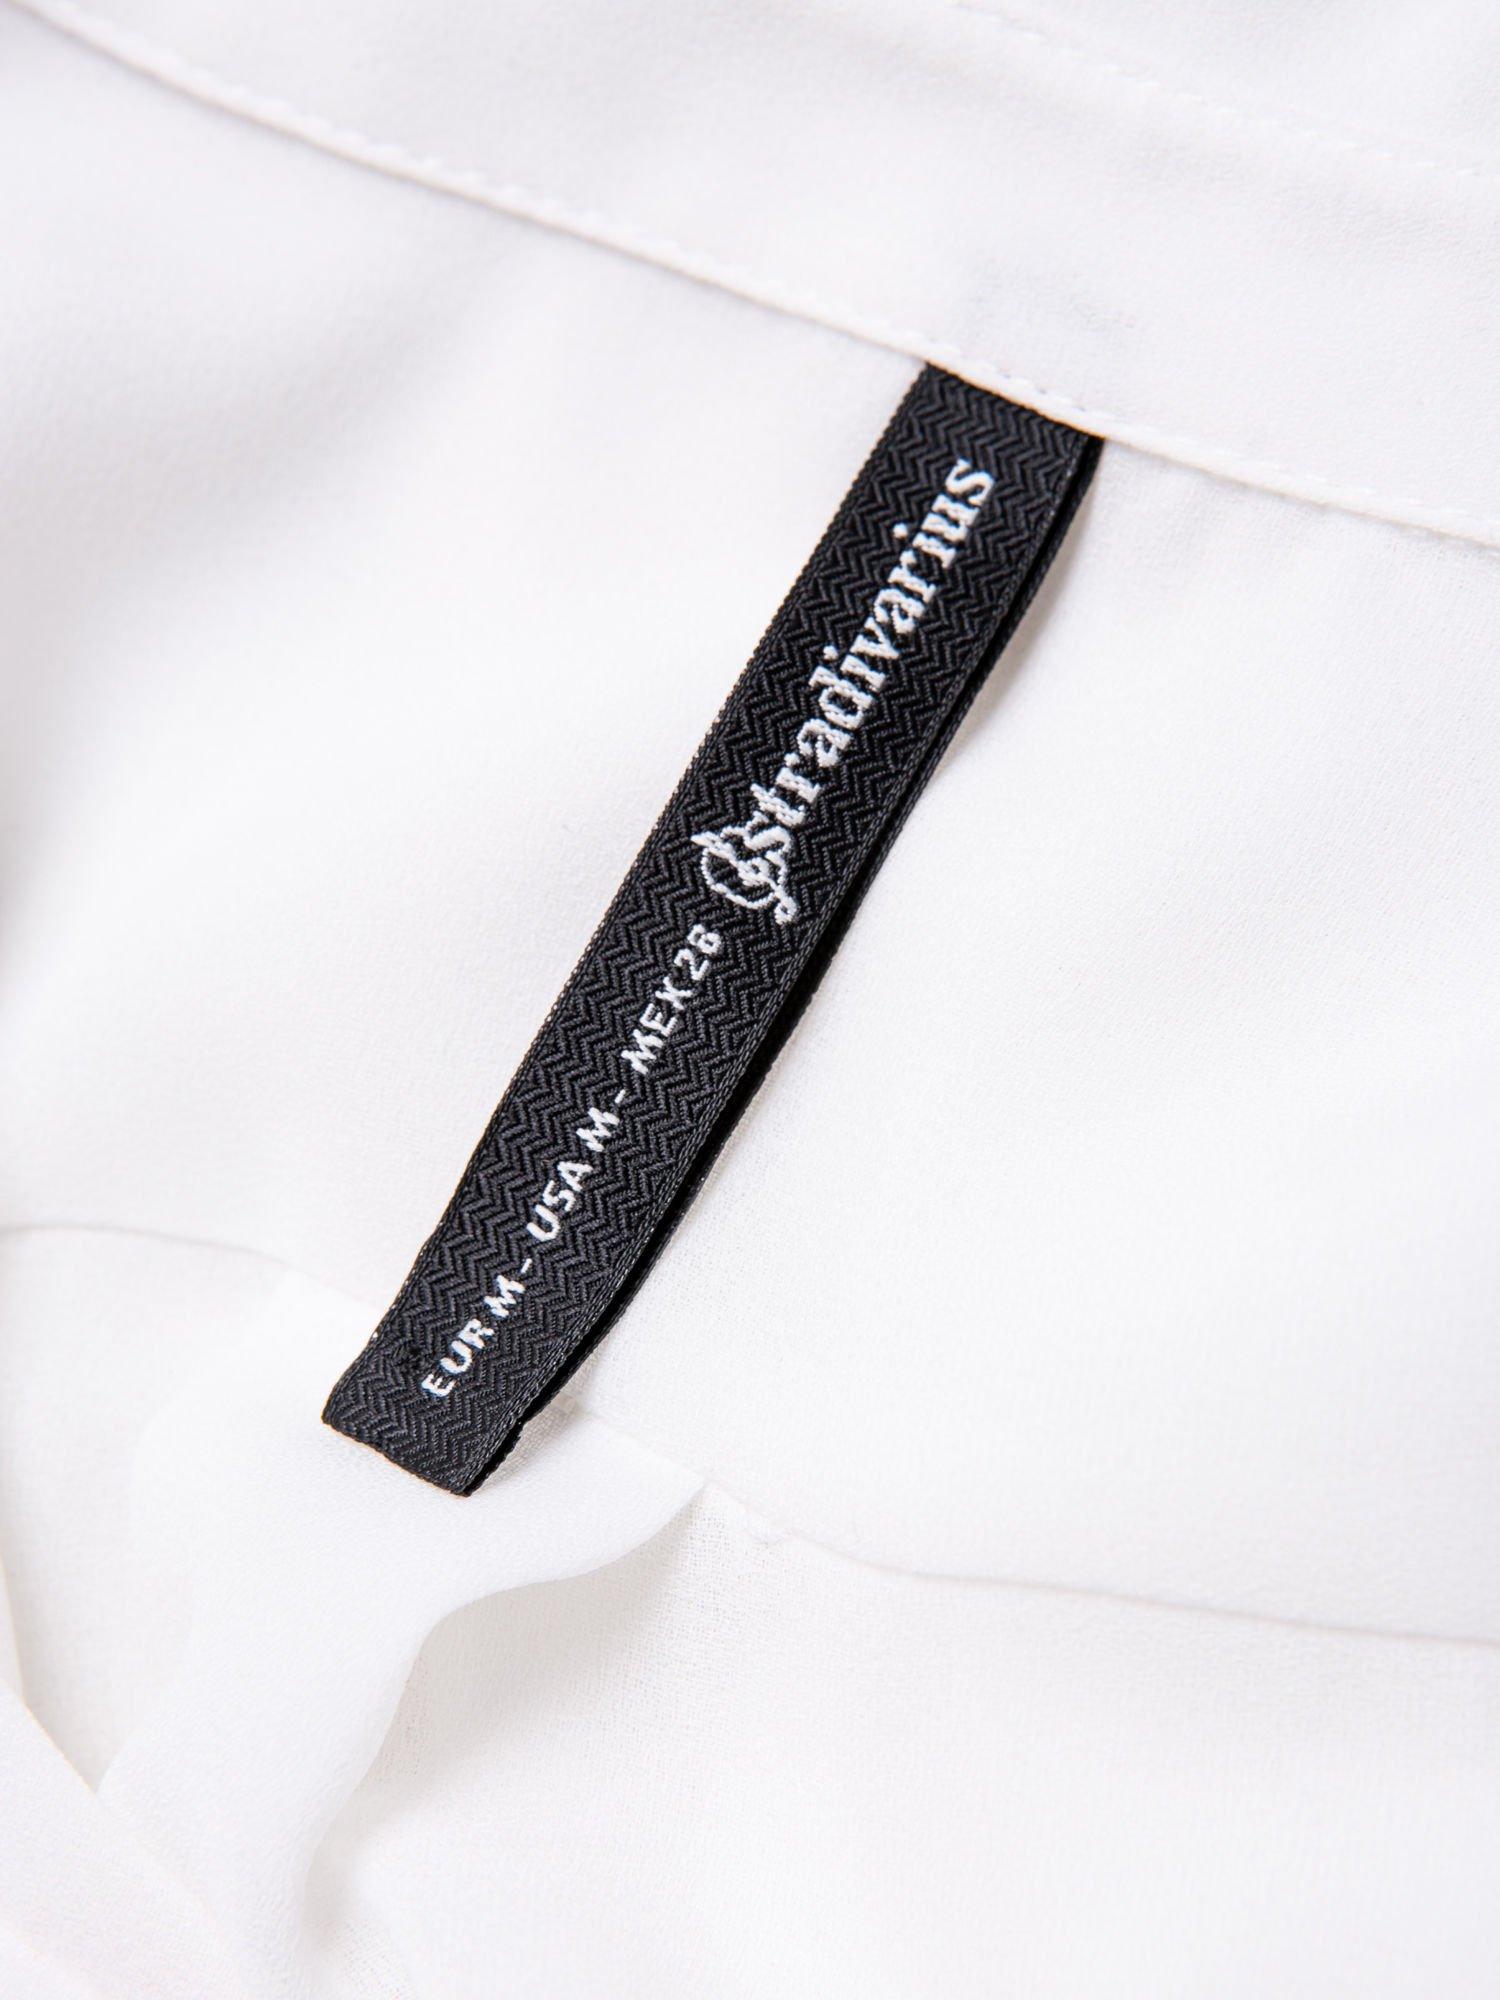 STRADIVARIUS Sukienka dwuczęściowa typu koszula + spódnica                                  zdj.                                  3